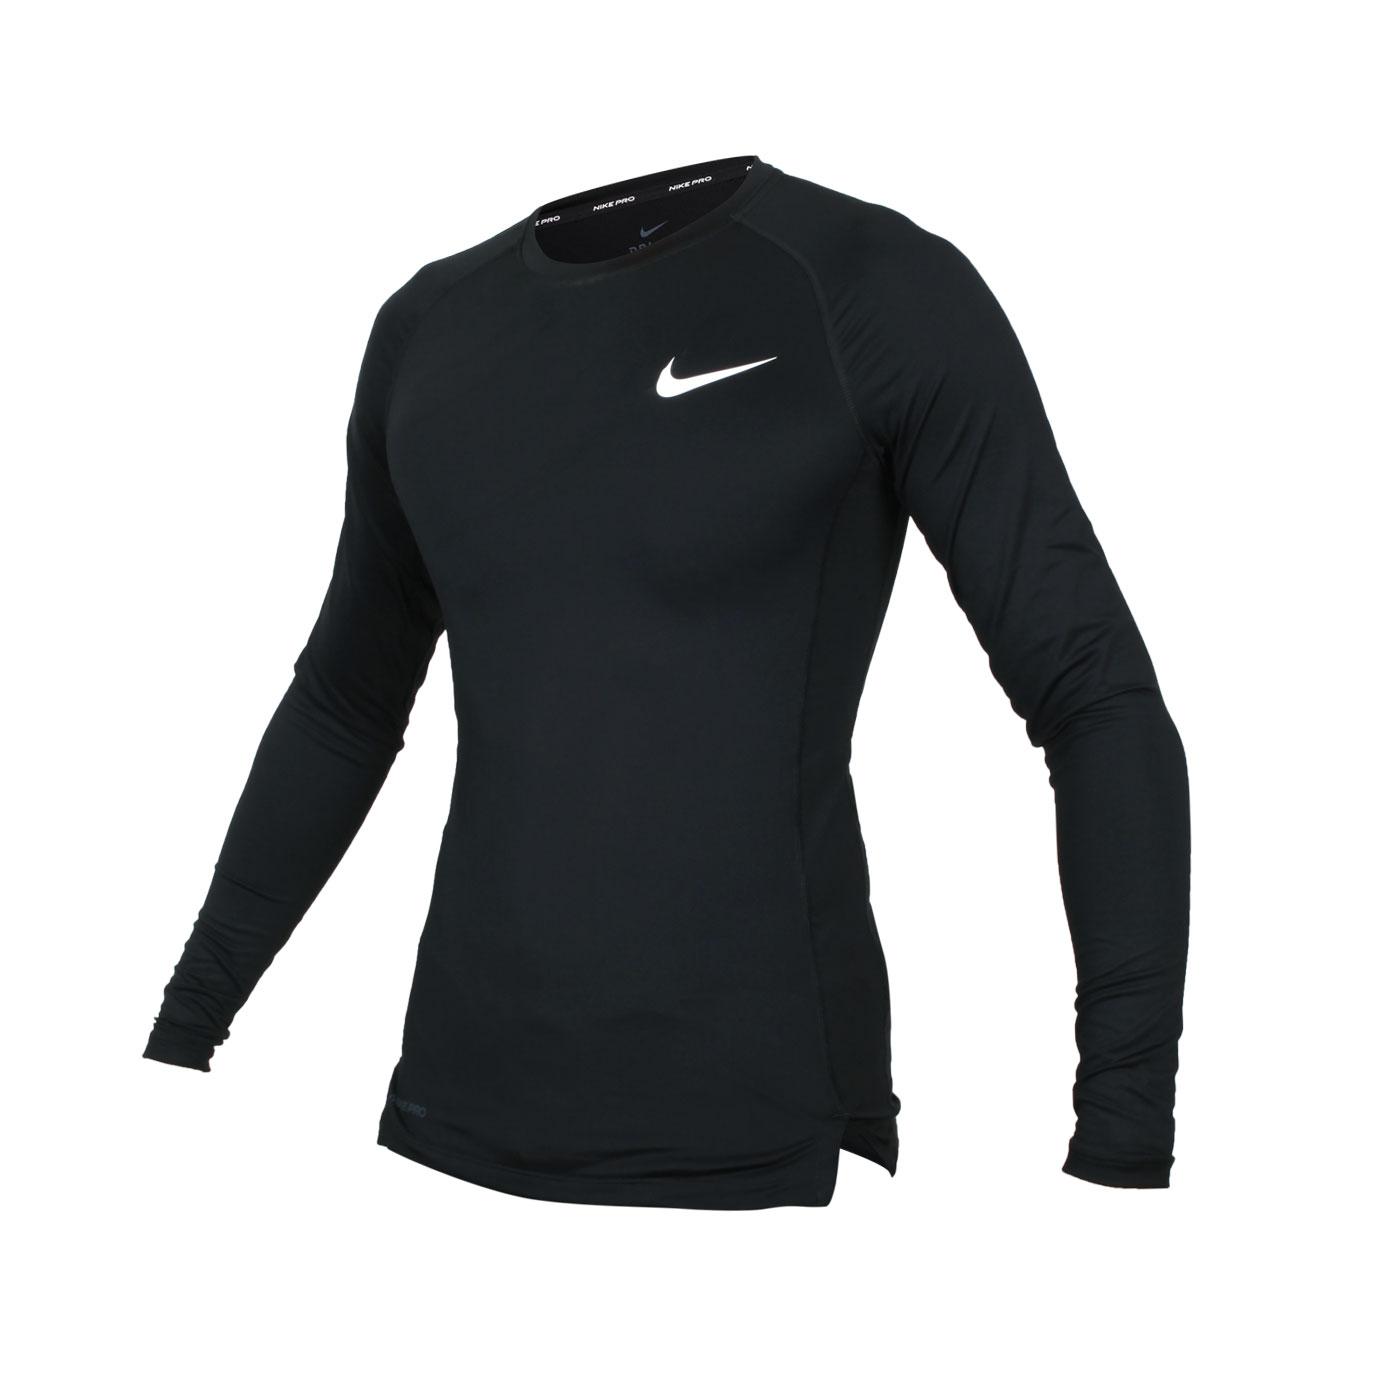 NIKE 男款長袖緊身T恤 BV5589-010 - 黑白